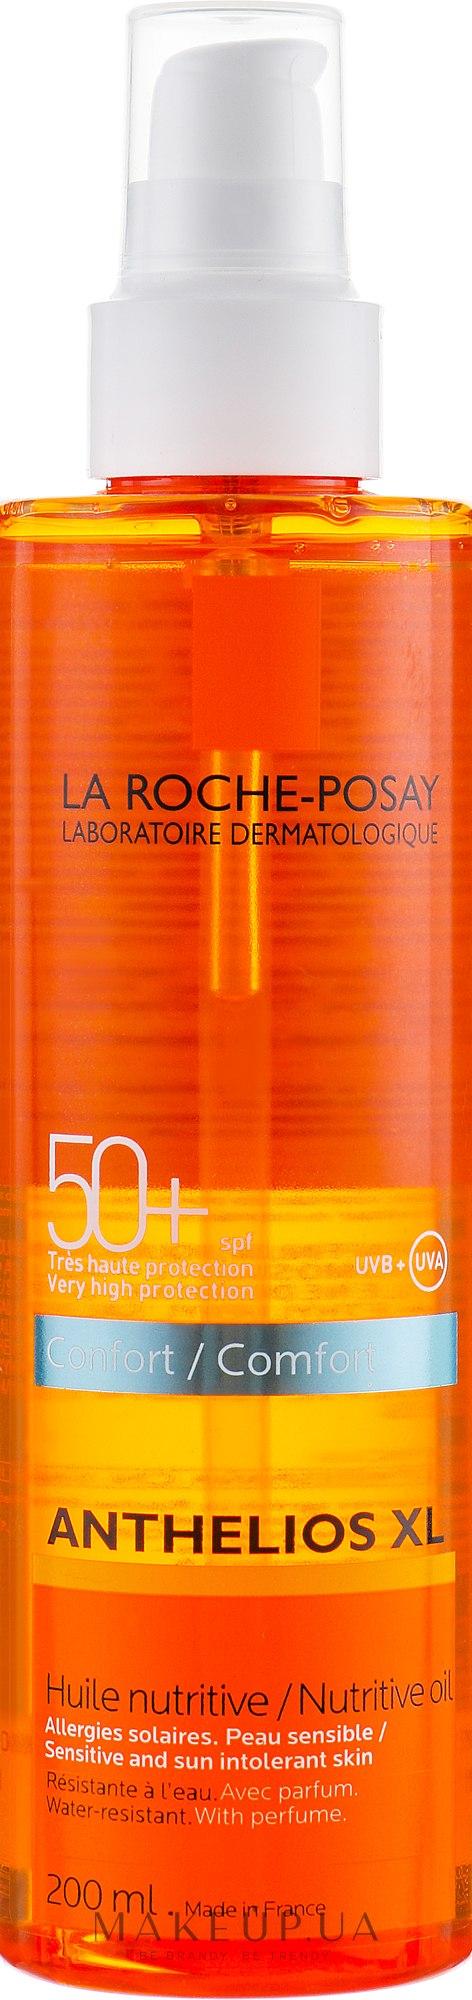 Солнцезащитное средство для лица и тела (La Roche-Posay Anthelios Xl Invisible Nutritive Oil Spf 50+)